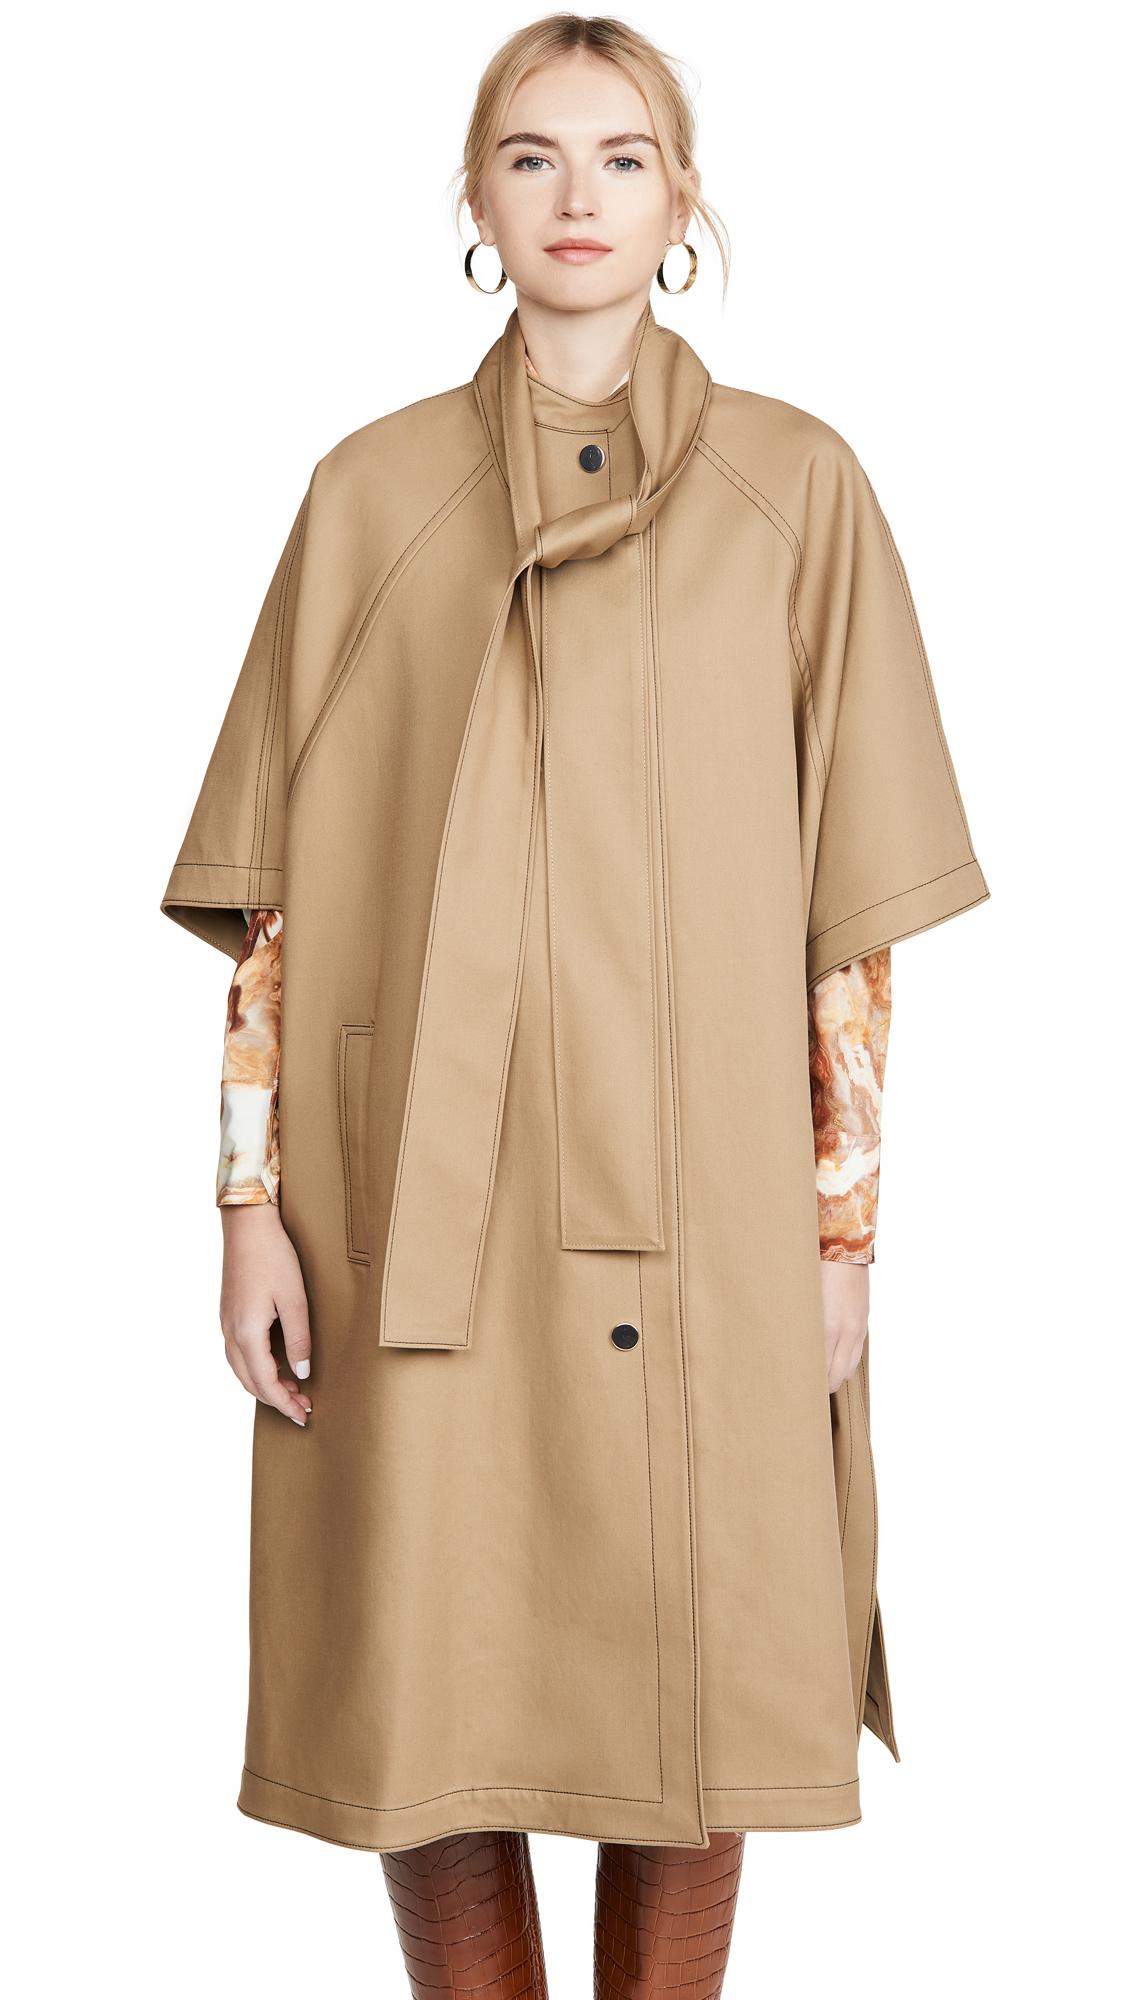 Buy Jason Wu Cotton Poncho Rain Coat online beautiful Jason Wu Jackets, Coats, Trench Coats